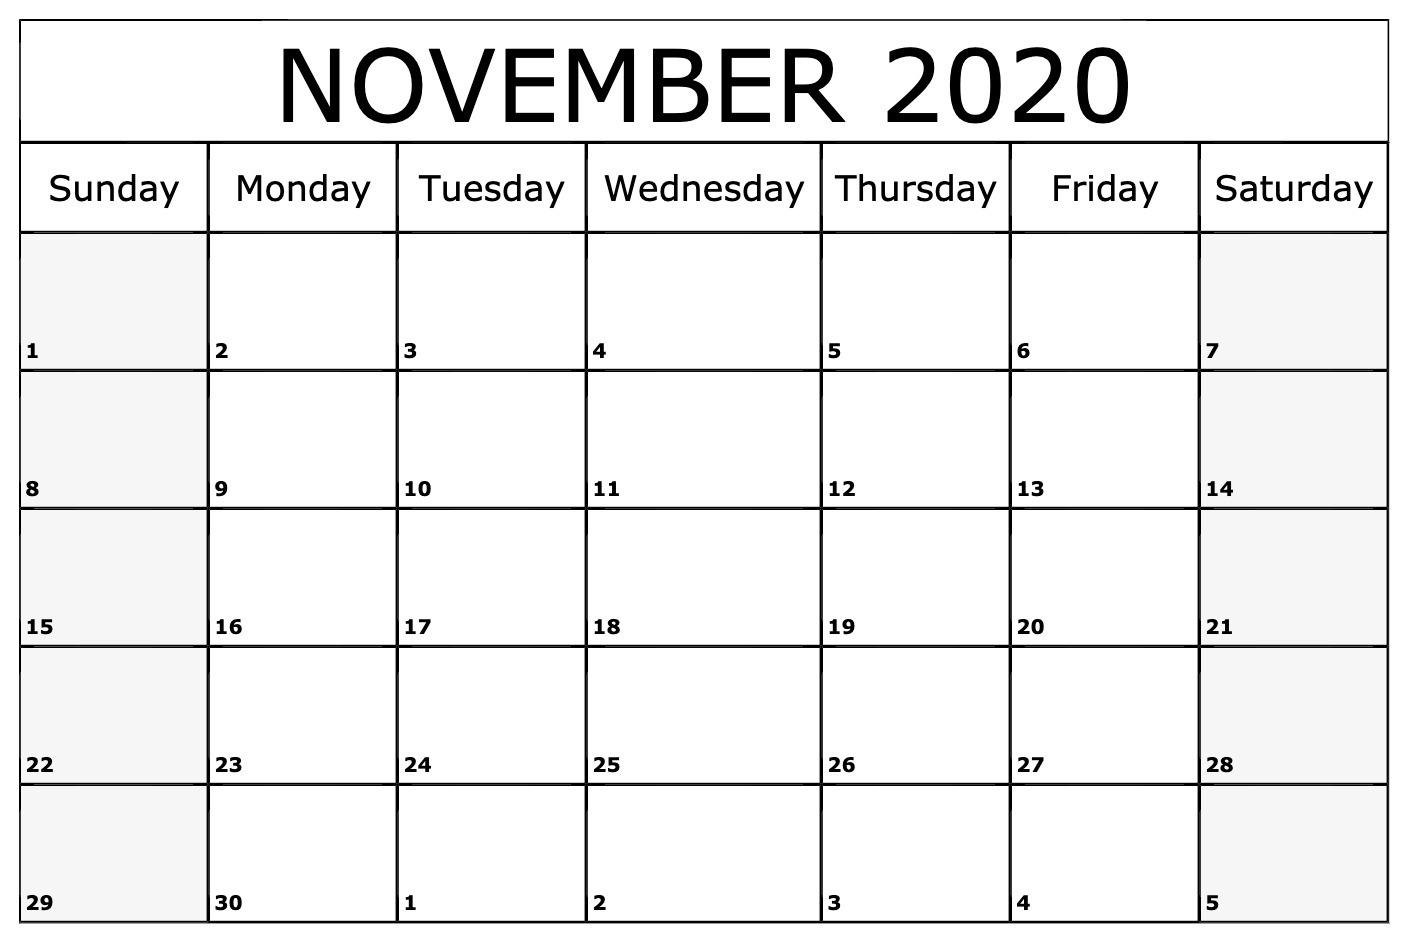 November 2020 Calendar Pdf, Word, Excel Template